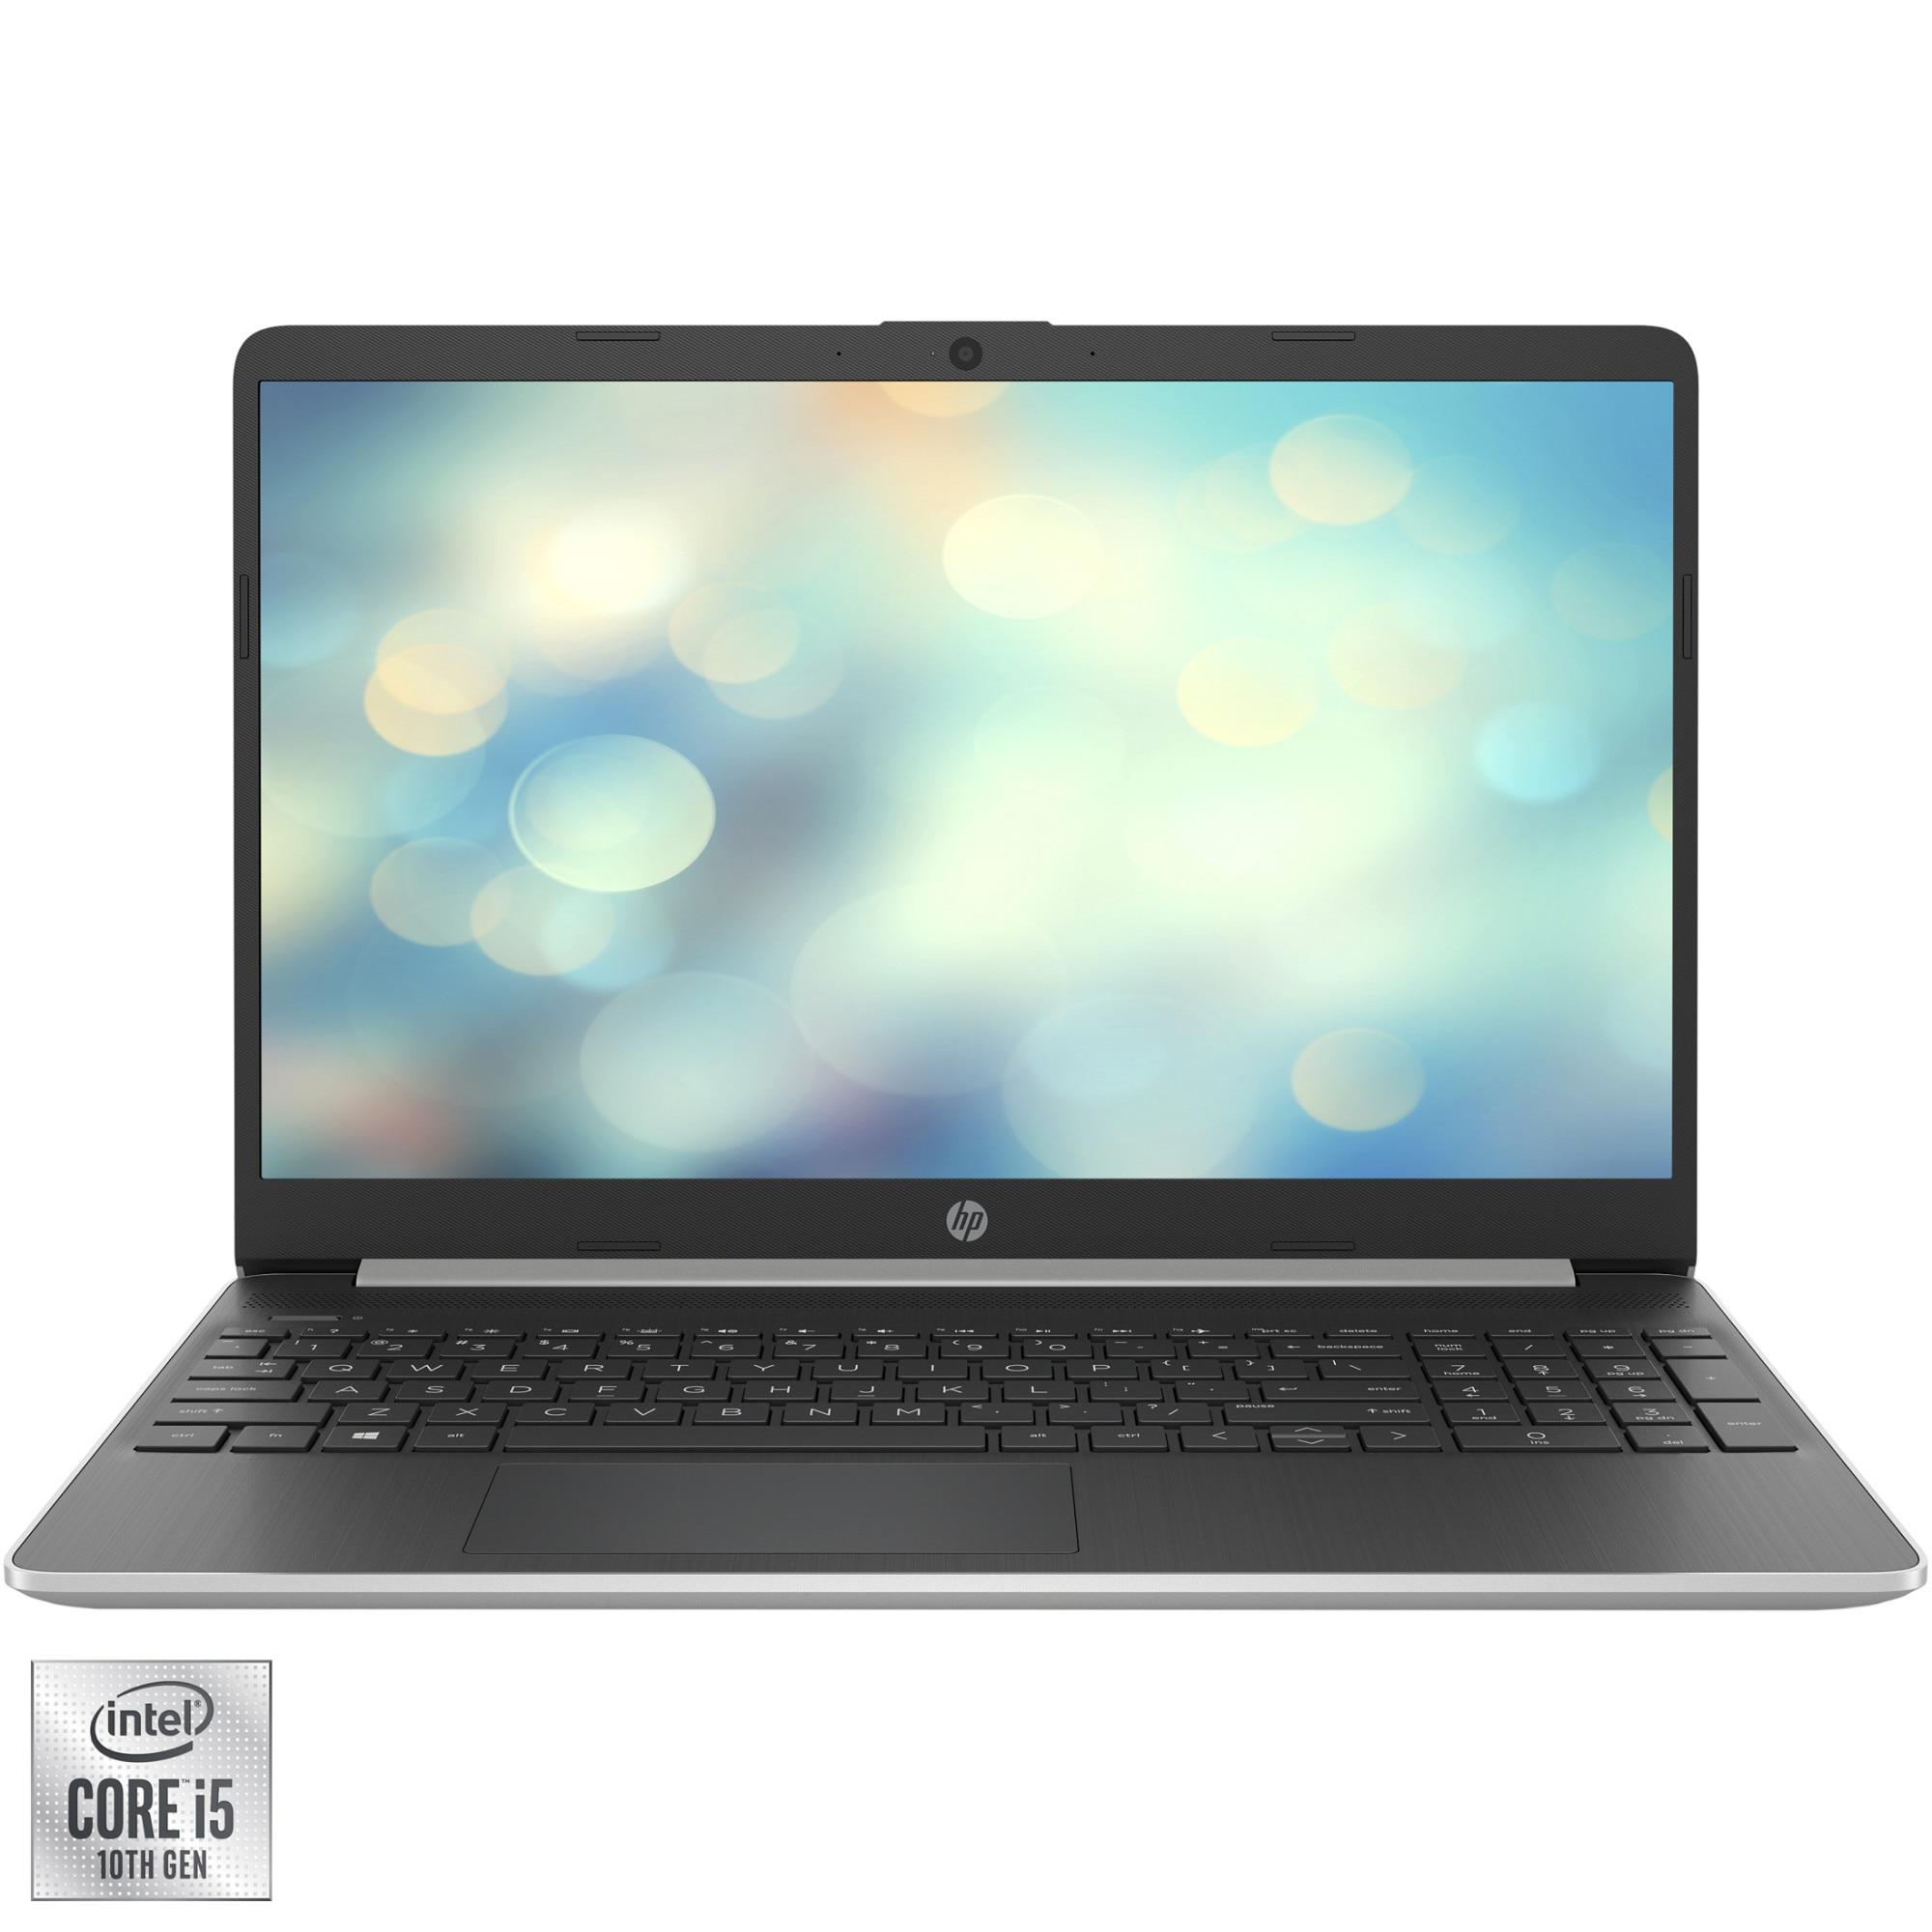 "Fotografie Laptop HP 15s-fq1024nq cu procesor Intel Core i5-1035G1 pana la 3.60 GHz, 15.6"", Full HD, 16GB, 256GB SSD, Intel UHD Graphics, Free DOS, Silver"